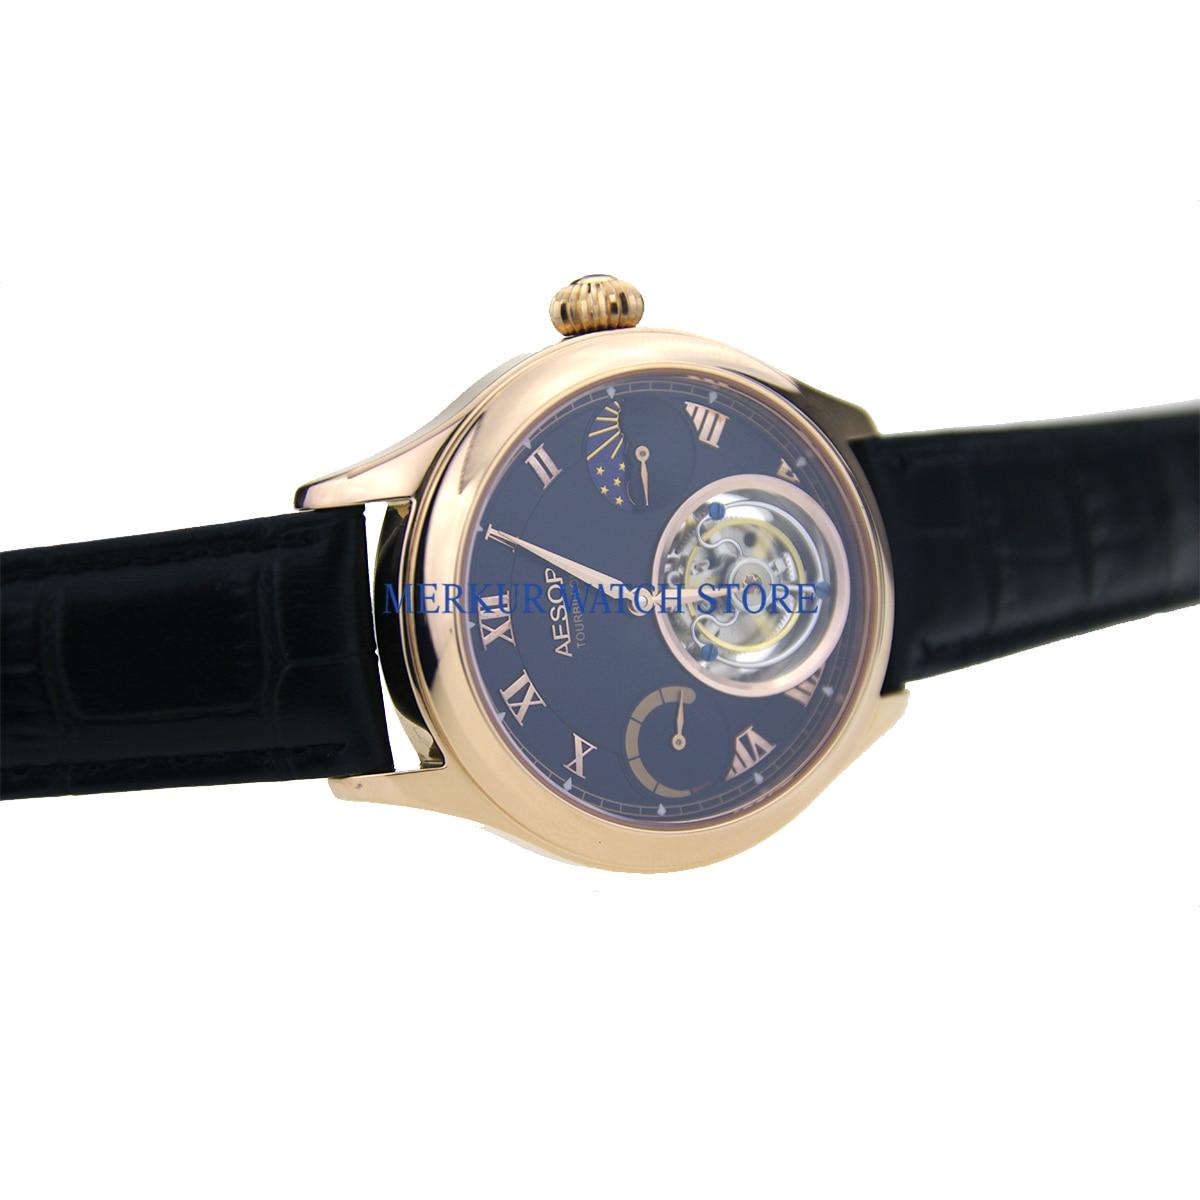 Merkur relógio masculino mecânico tianjin hangzhou alta batida tourbillon movimento skelenton luxo vestido banhado a ouro mostrador preto